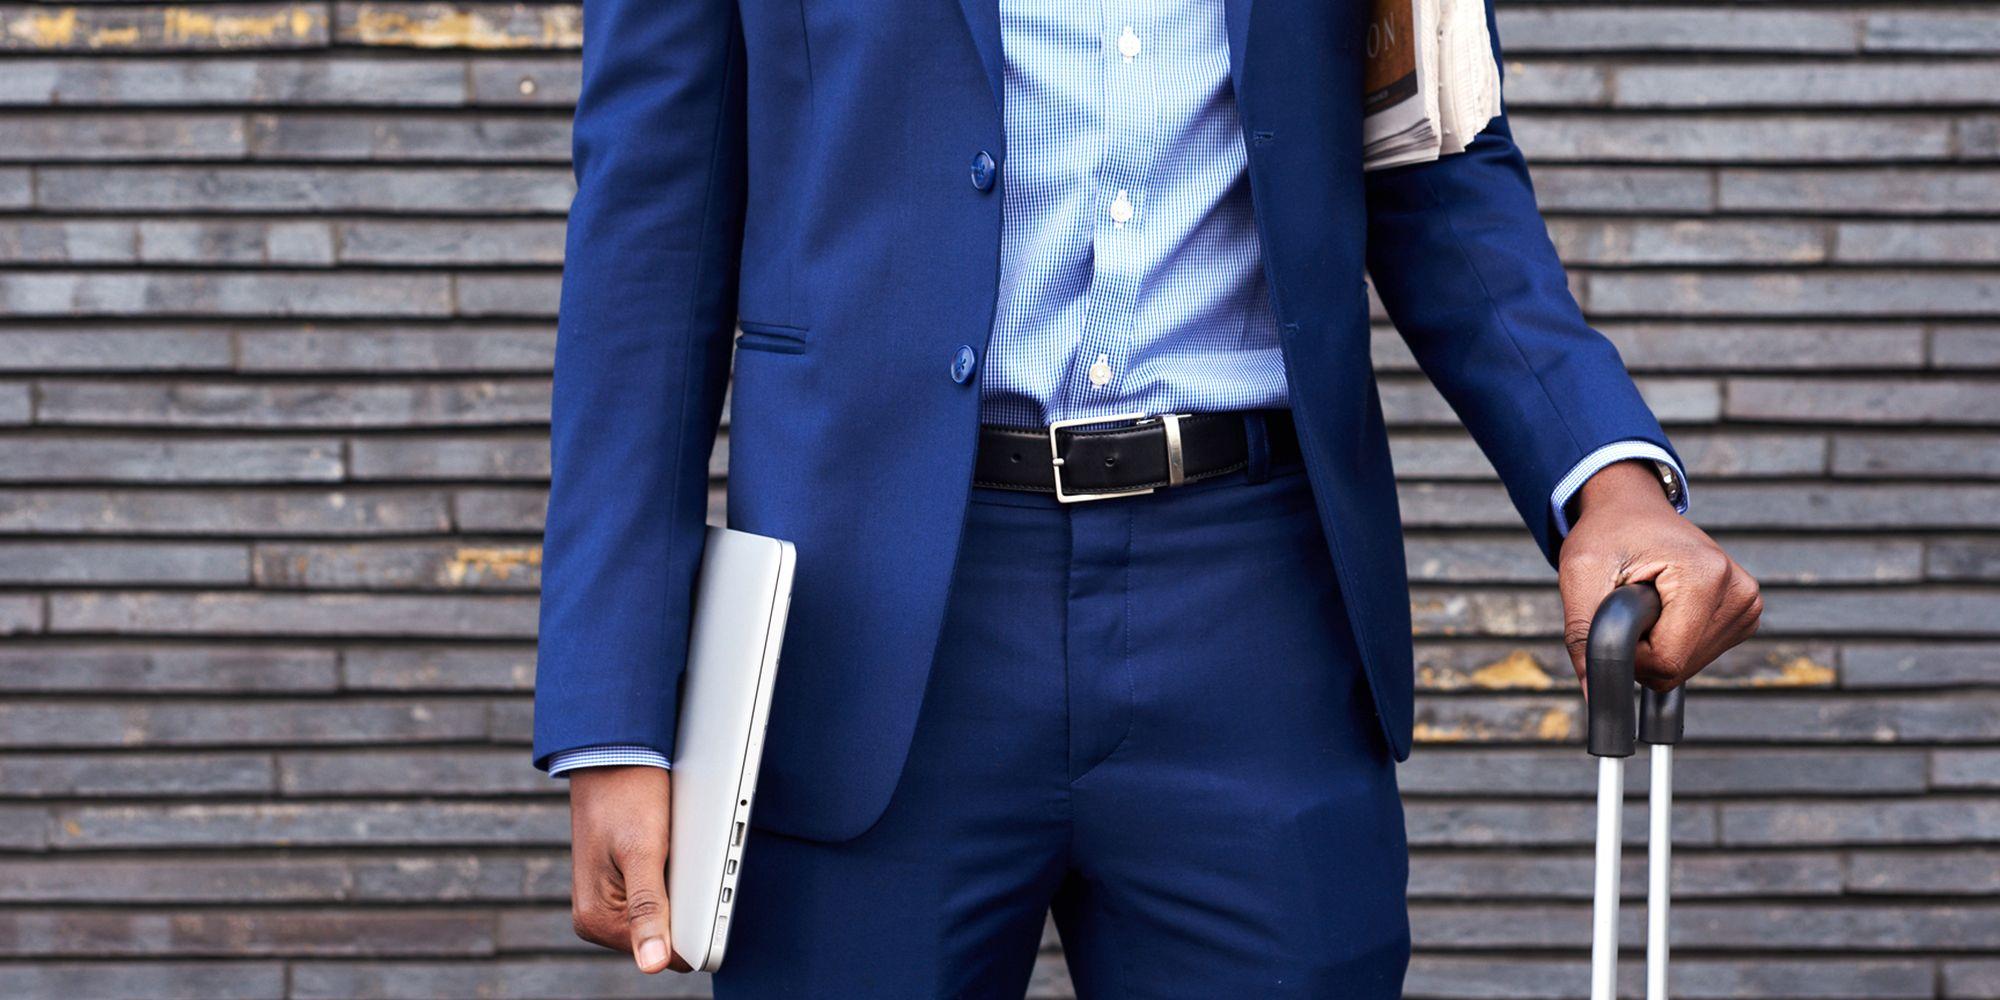 Mens Fashion Belts Libaifoundation Org Image Fashion